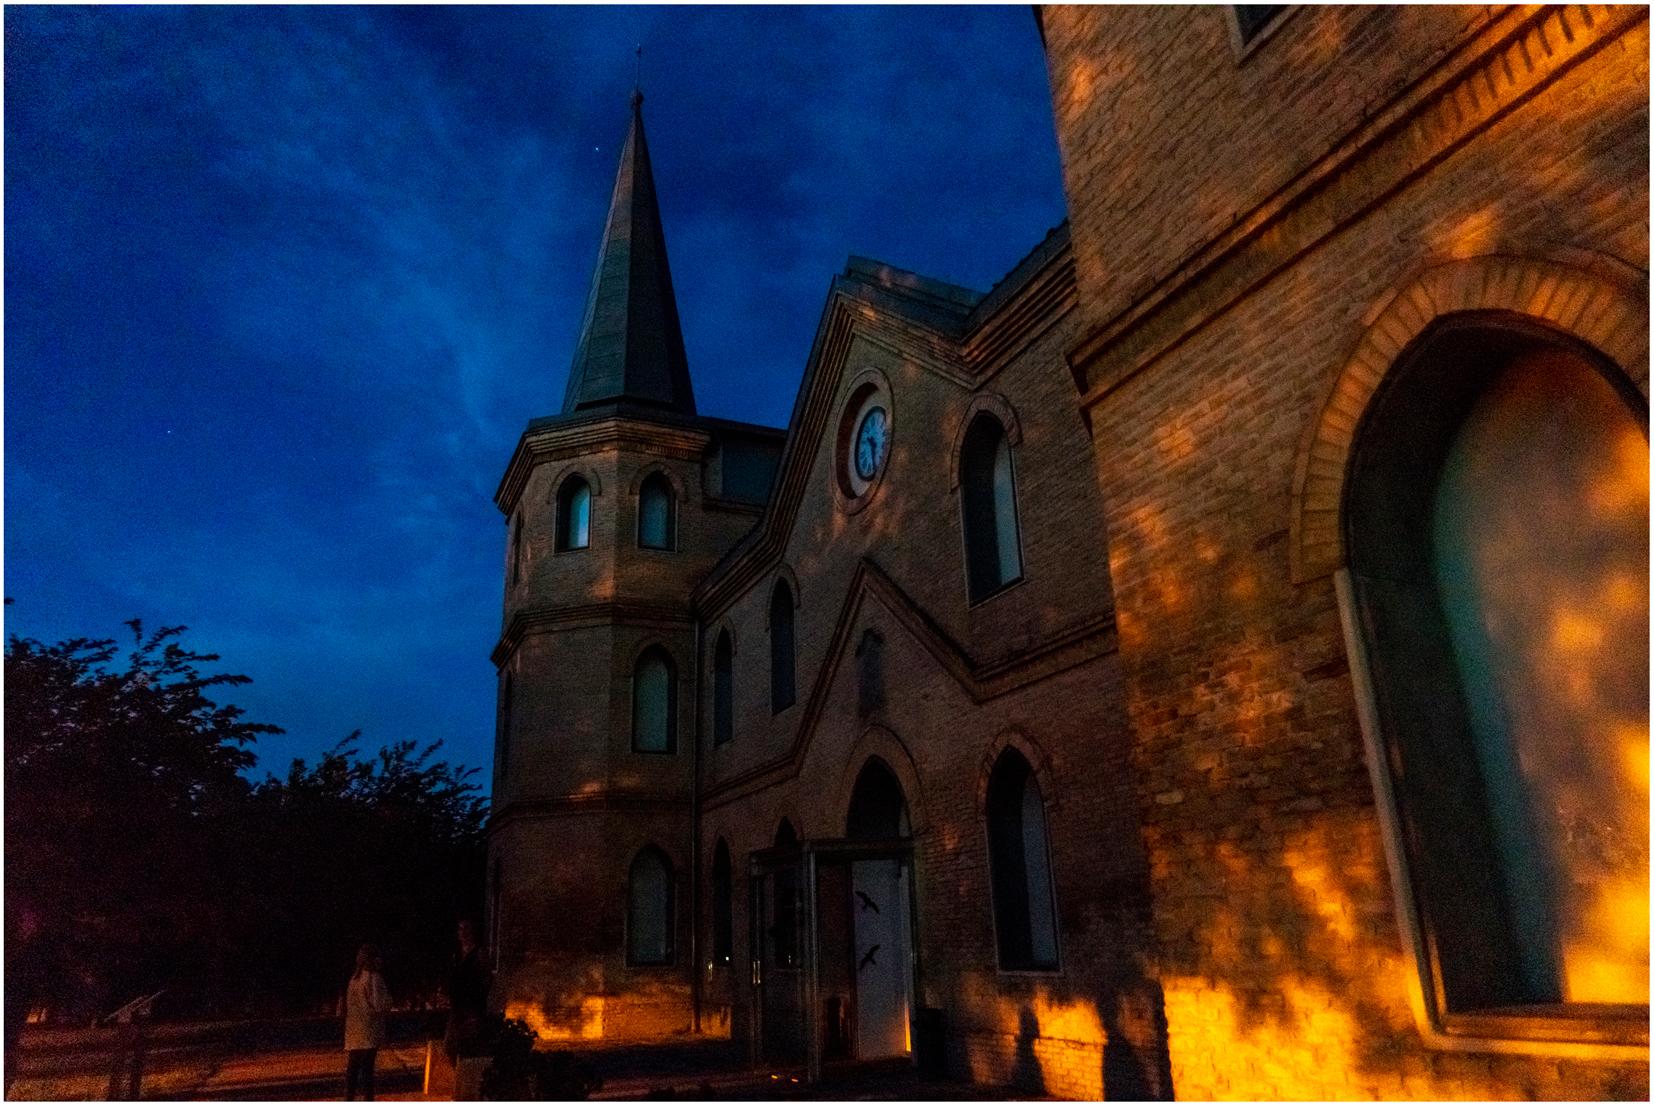 Convento de San Vicente de Paúl